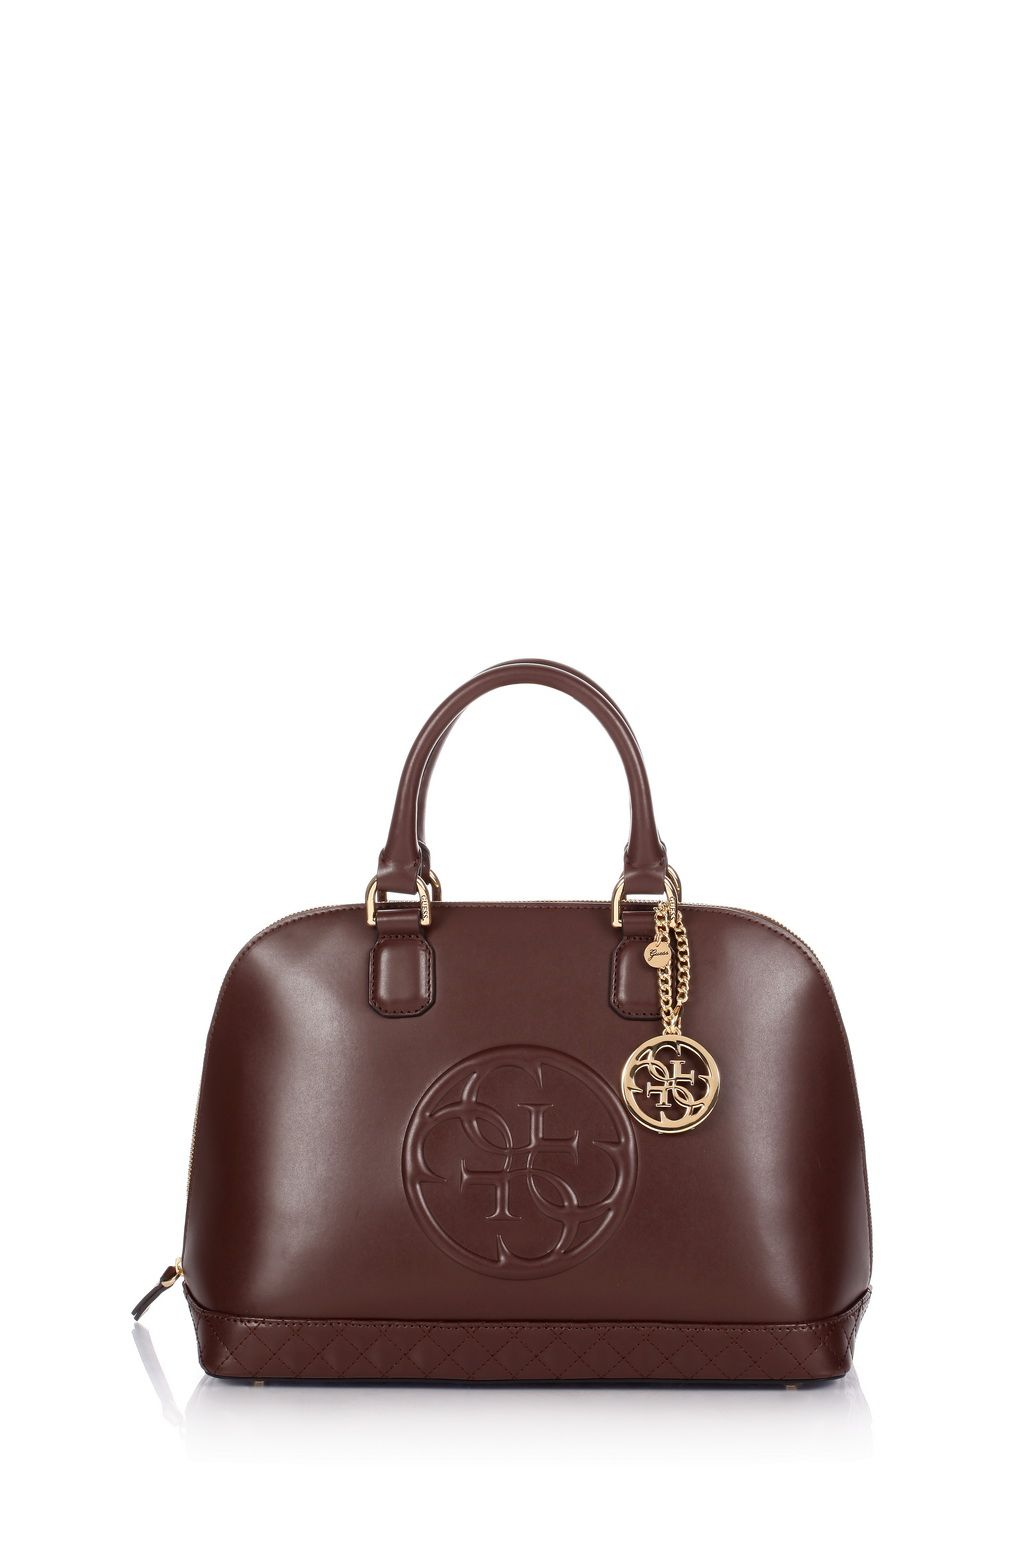 cda9194ada Guess handbags collection handbag reviews trending deals jpg 1030x1545 New guess  handbags collection